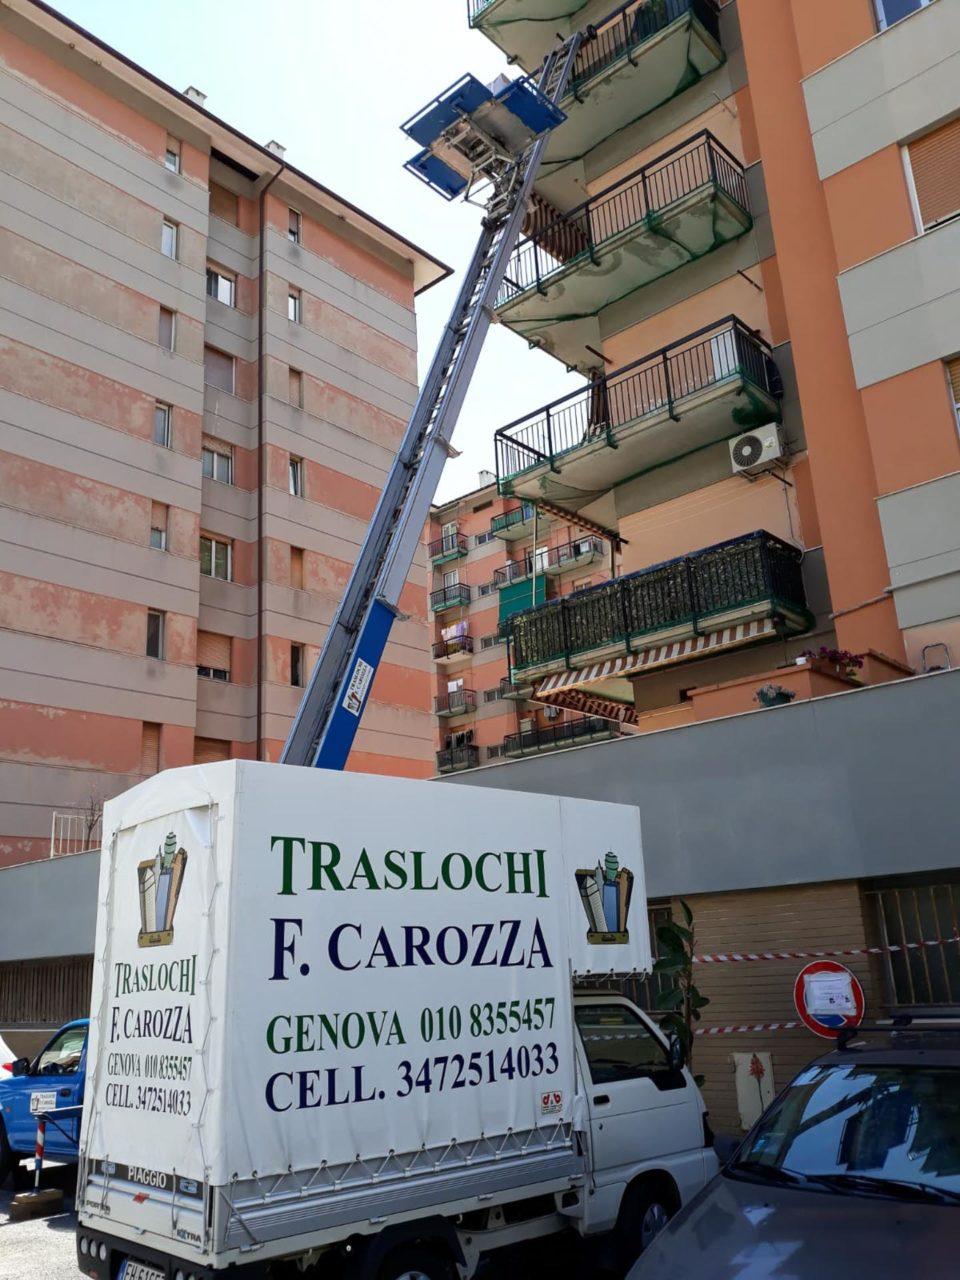 Traslochi Carozza Fiorenzo Genova-6